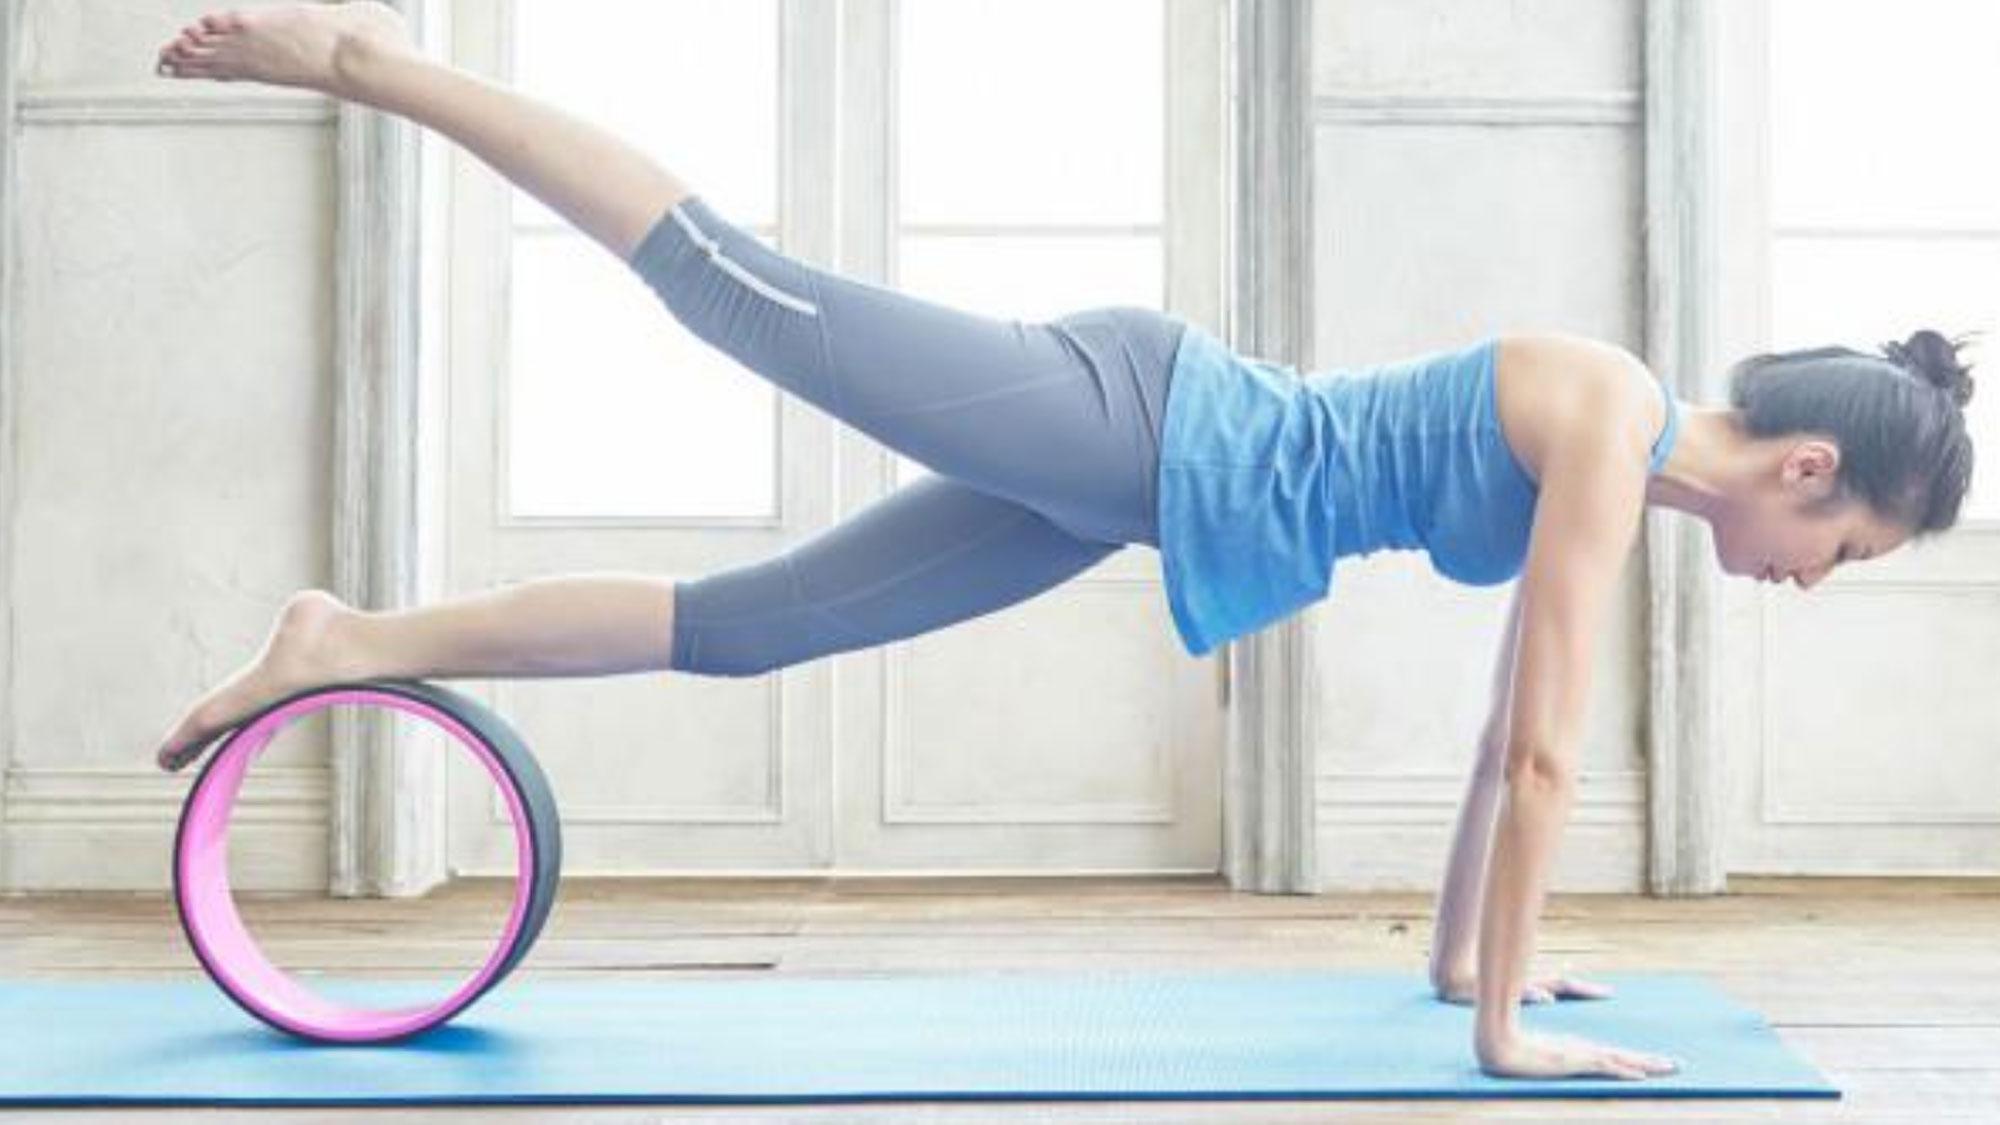 Best yoga mats: BalanceFrom GoYoga All Purpose High Density Non-Slip Exercise Yoga Mat